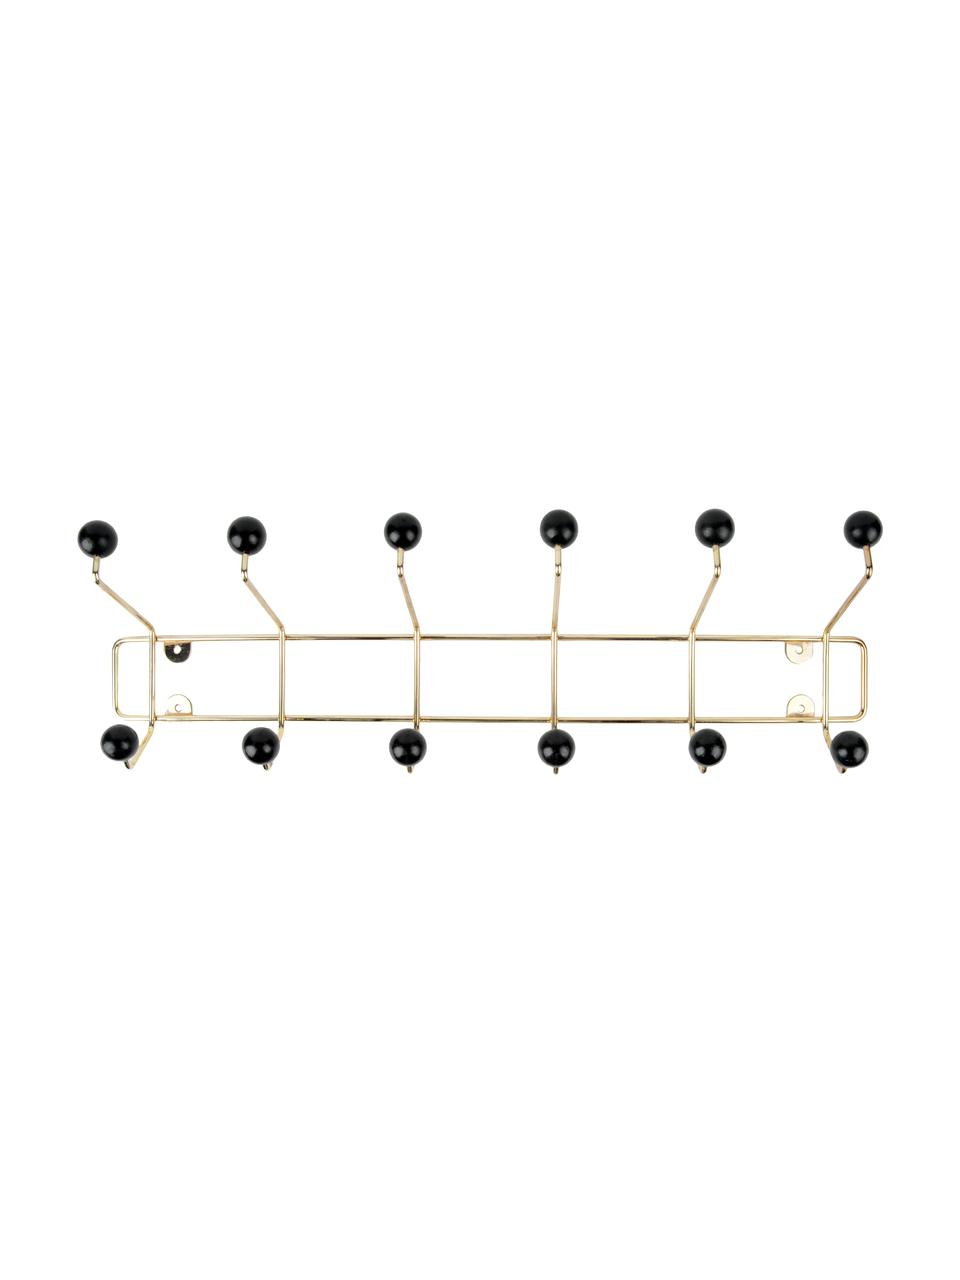 XL Metall-Garderobenhaken Saturnus, Gestell: Metall, lackiert, Haken: Kunststoff, Goldfarben, Schwarz, 54 x 16 cm